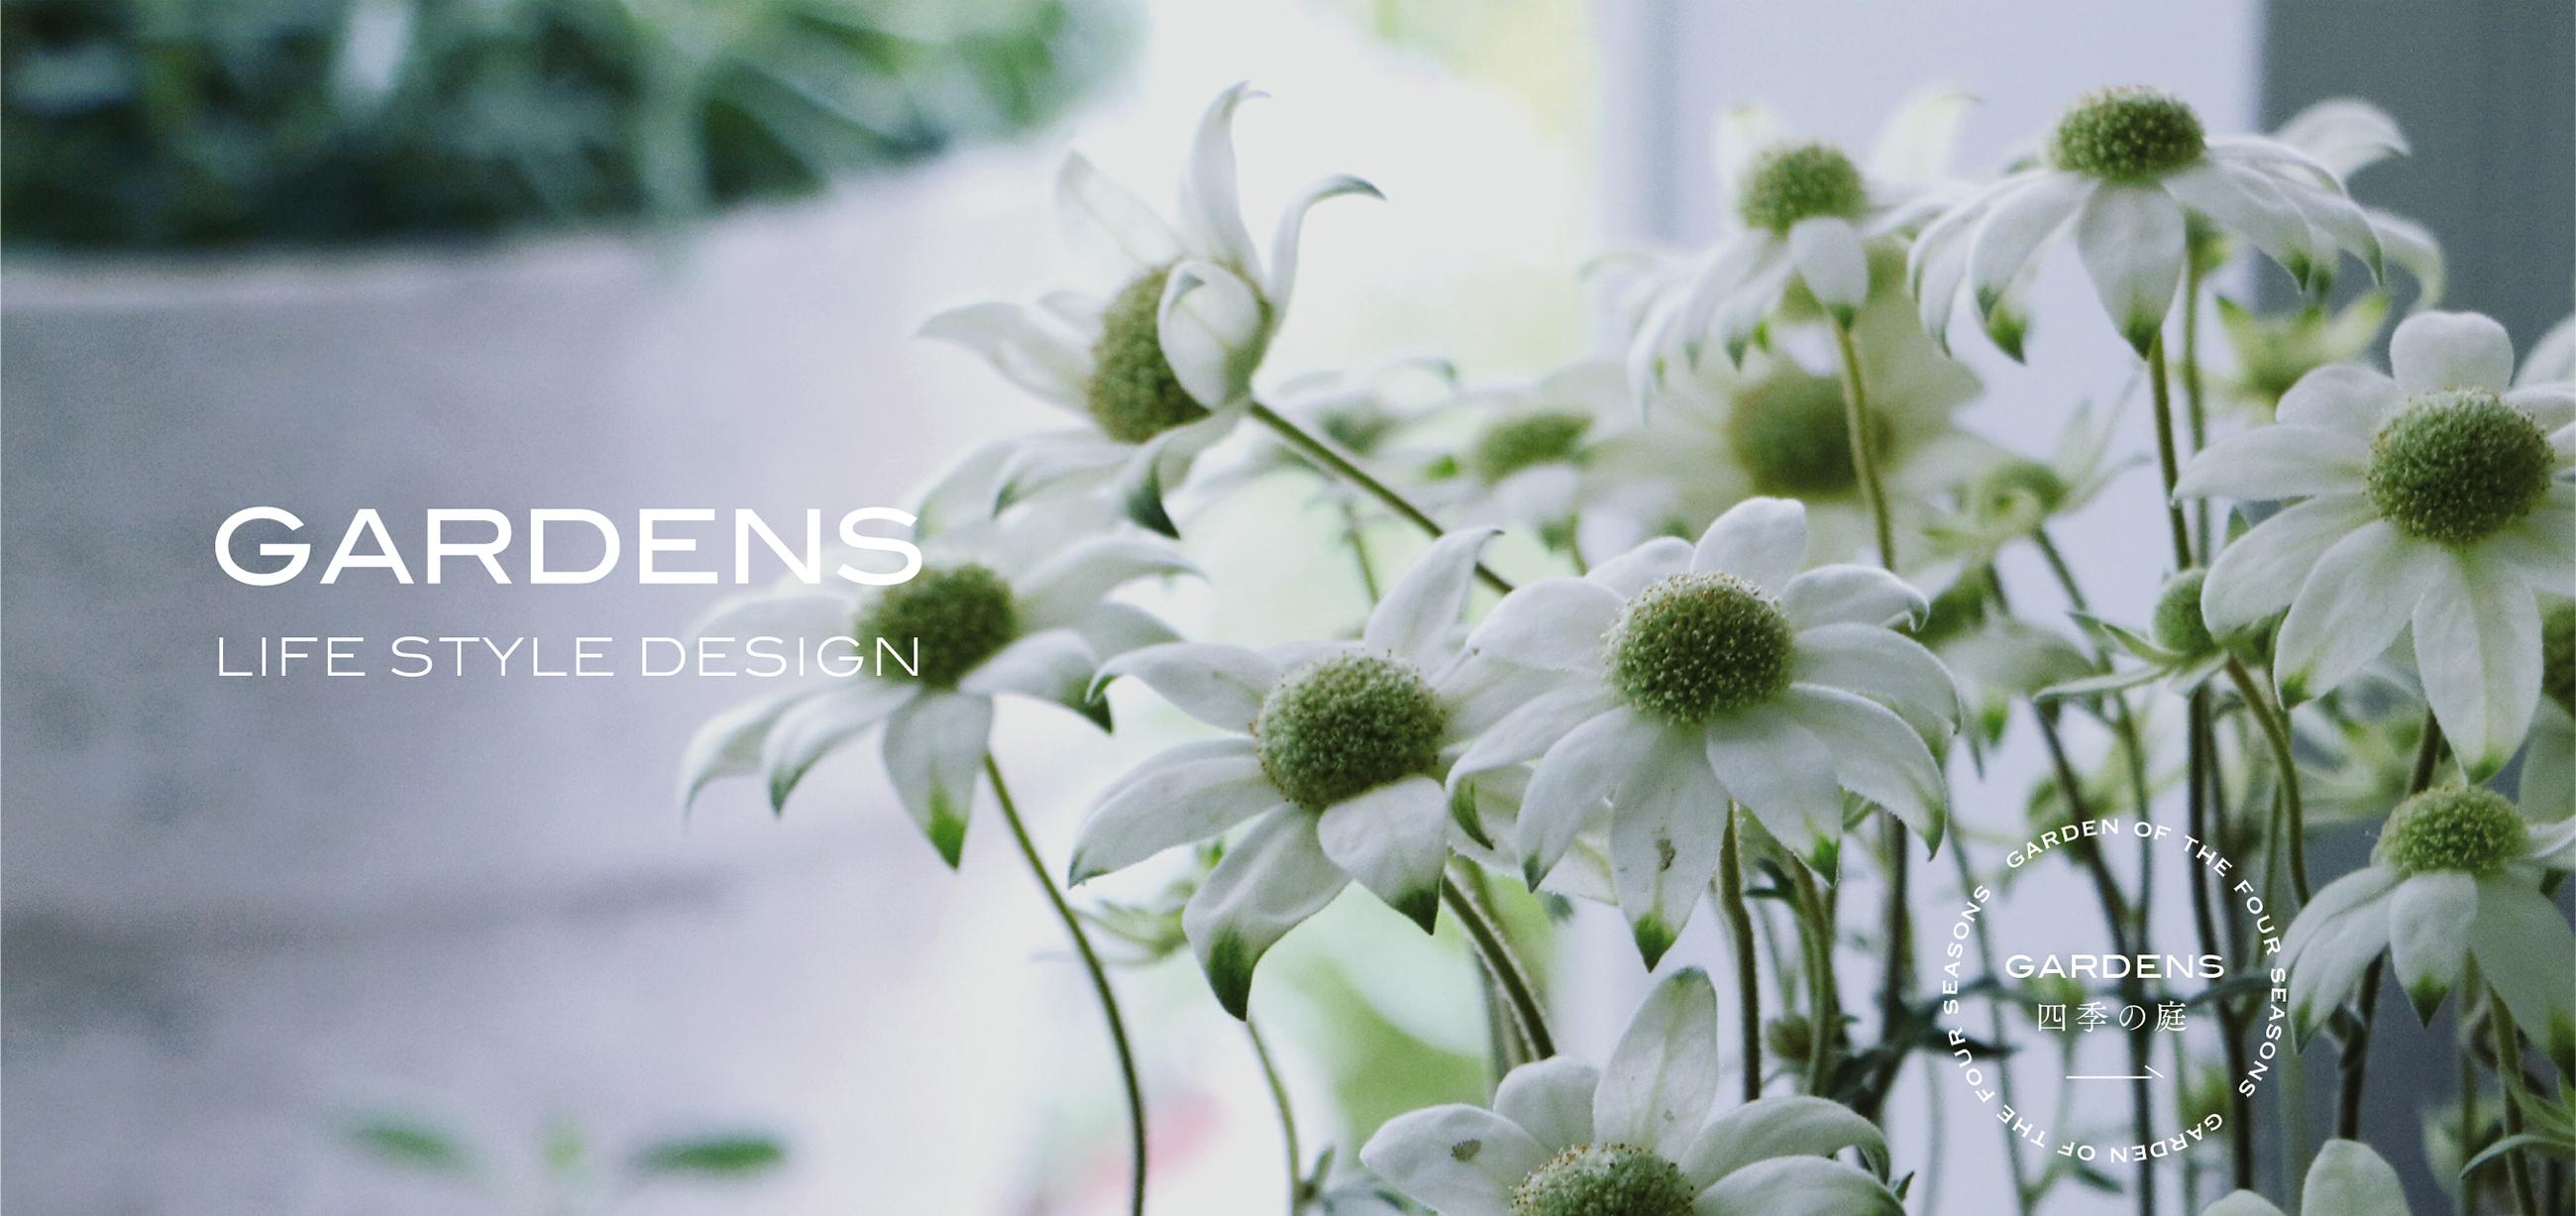 GARDENS lIFE 四季の庭